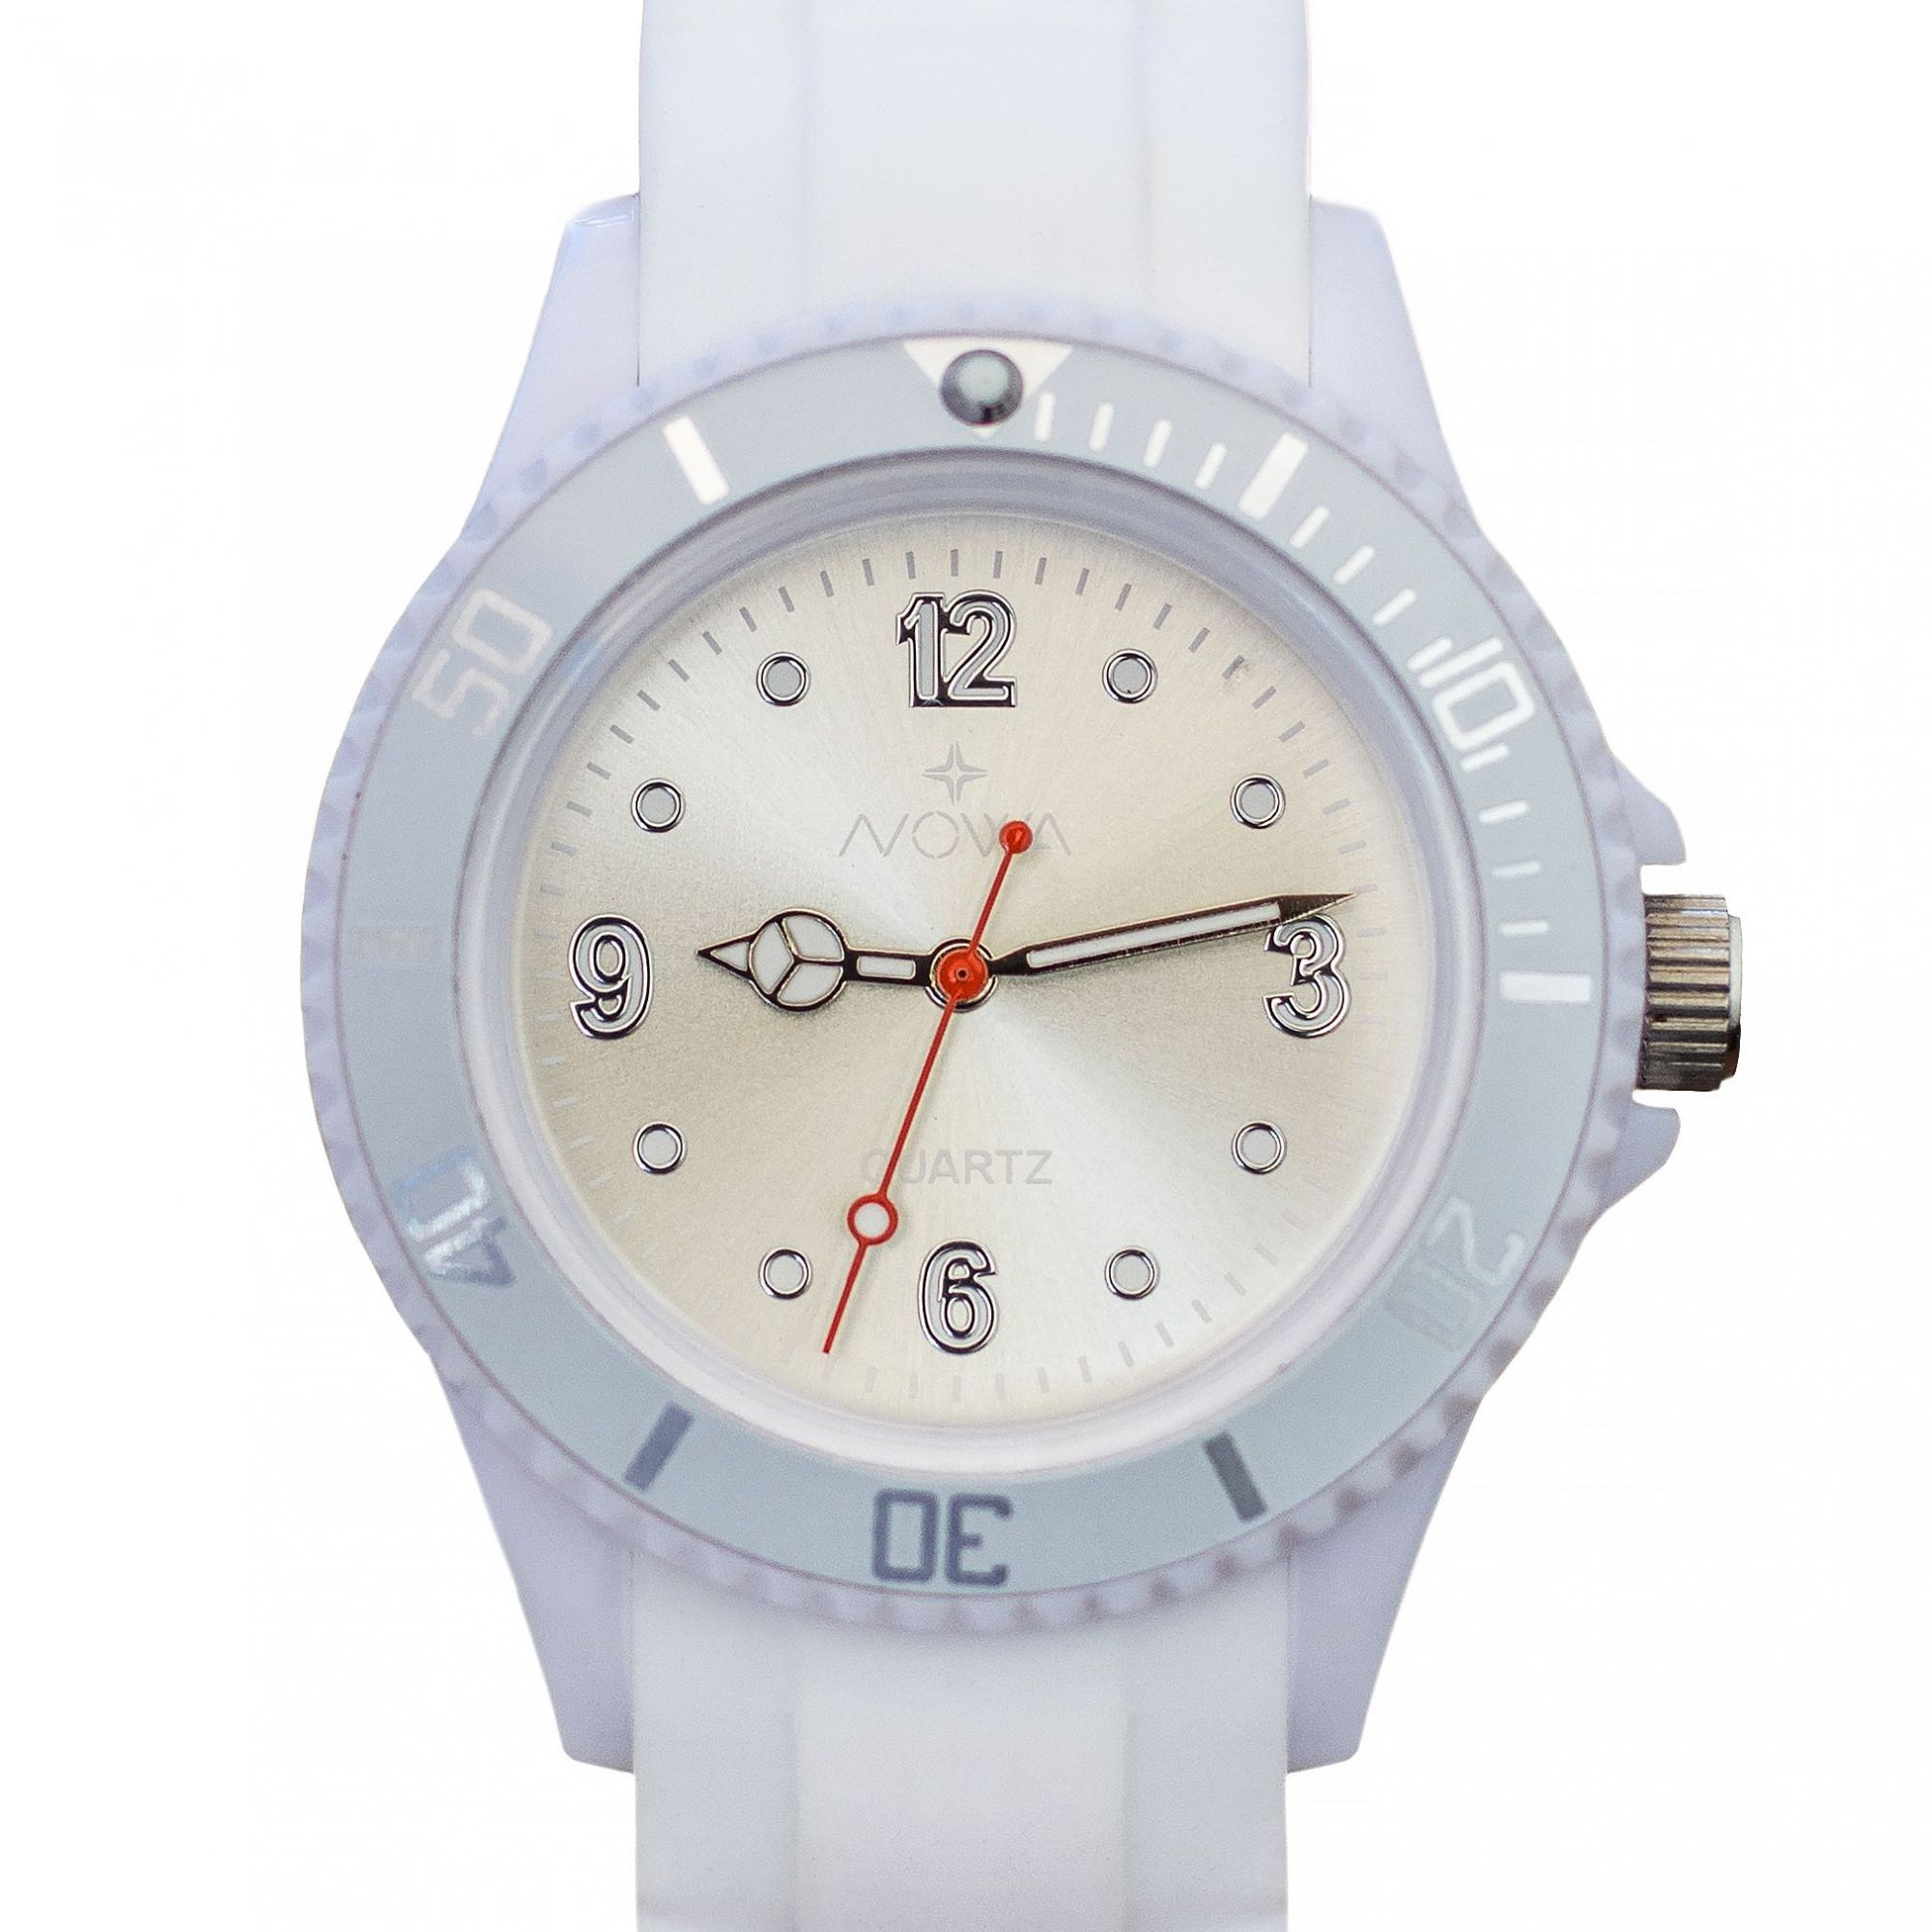 Relógio Nowa Feminino Branco NW0520BK Borracha